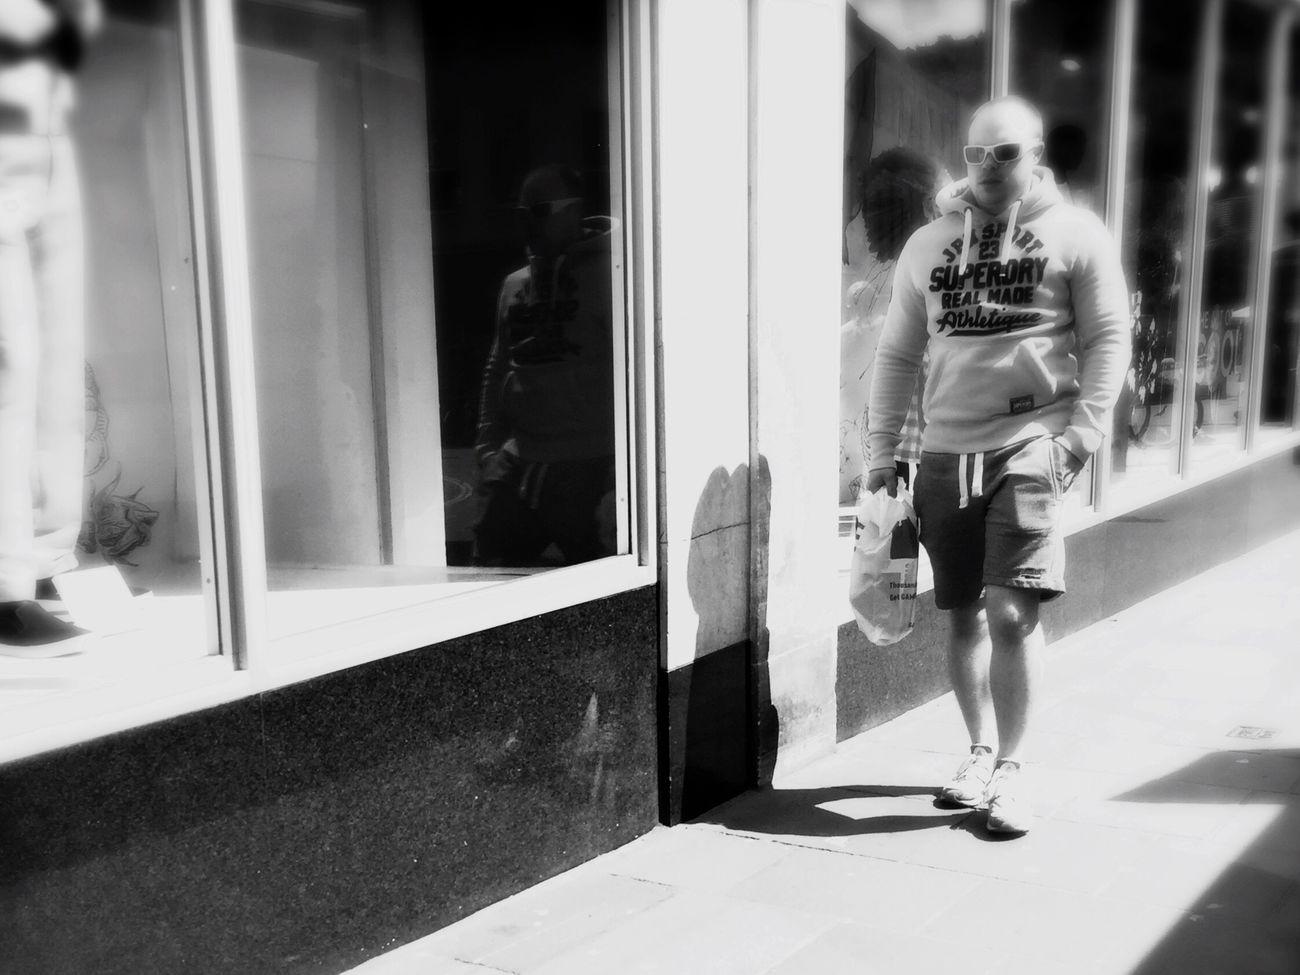 Streetphotography Candid Blackandwhite Shootermag_uk Shootermag Monochrome Streetphoto_bw